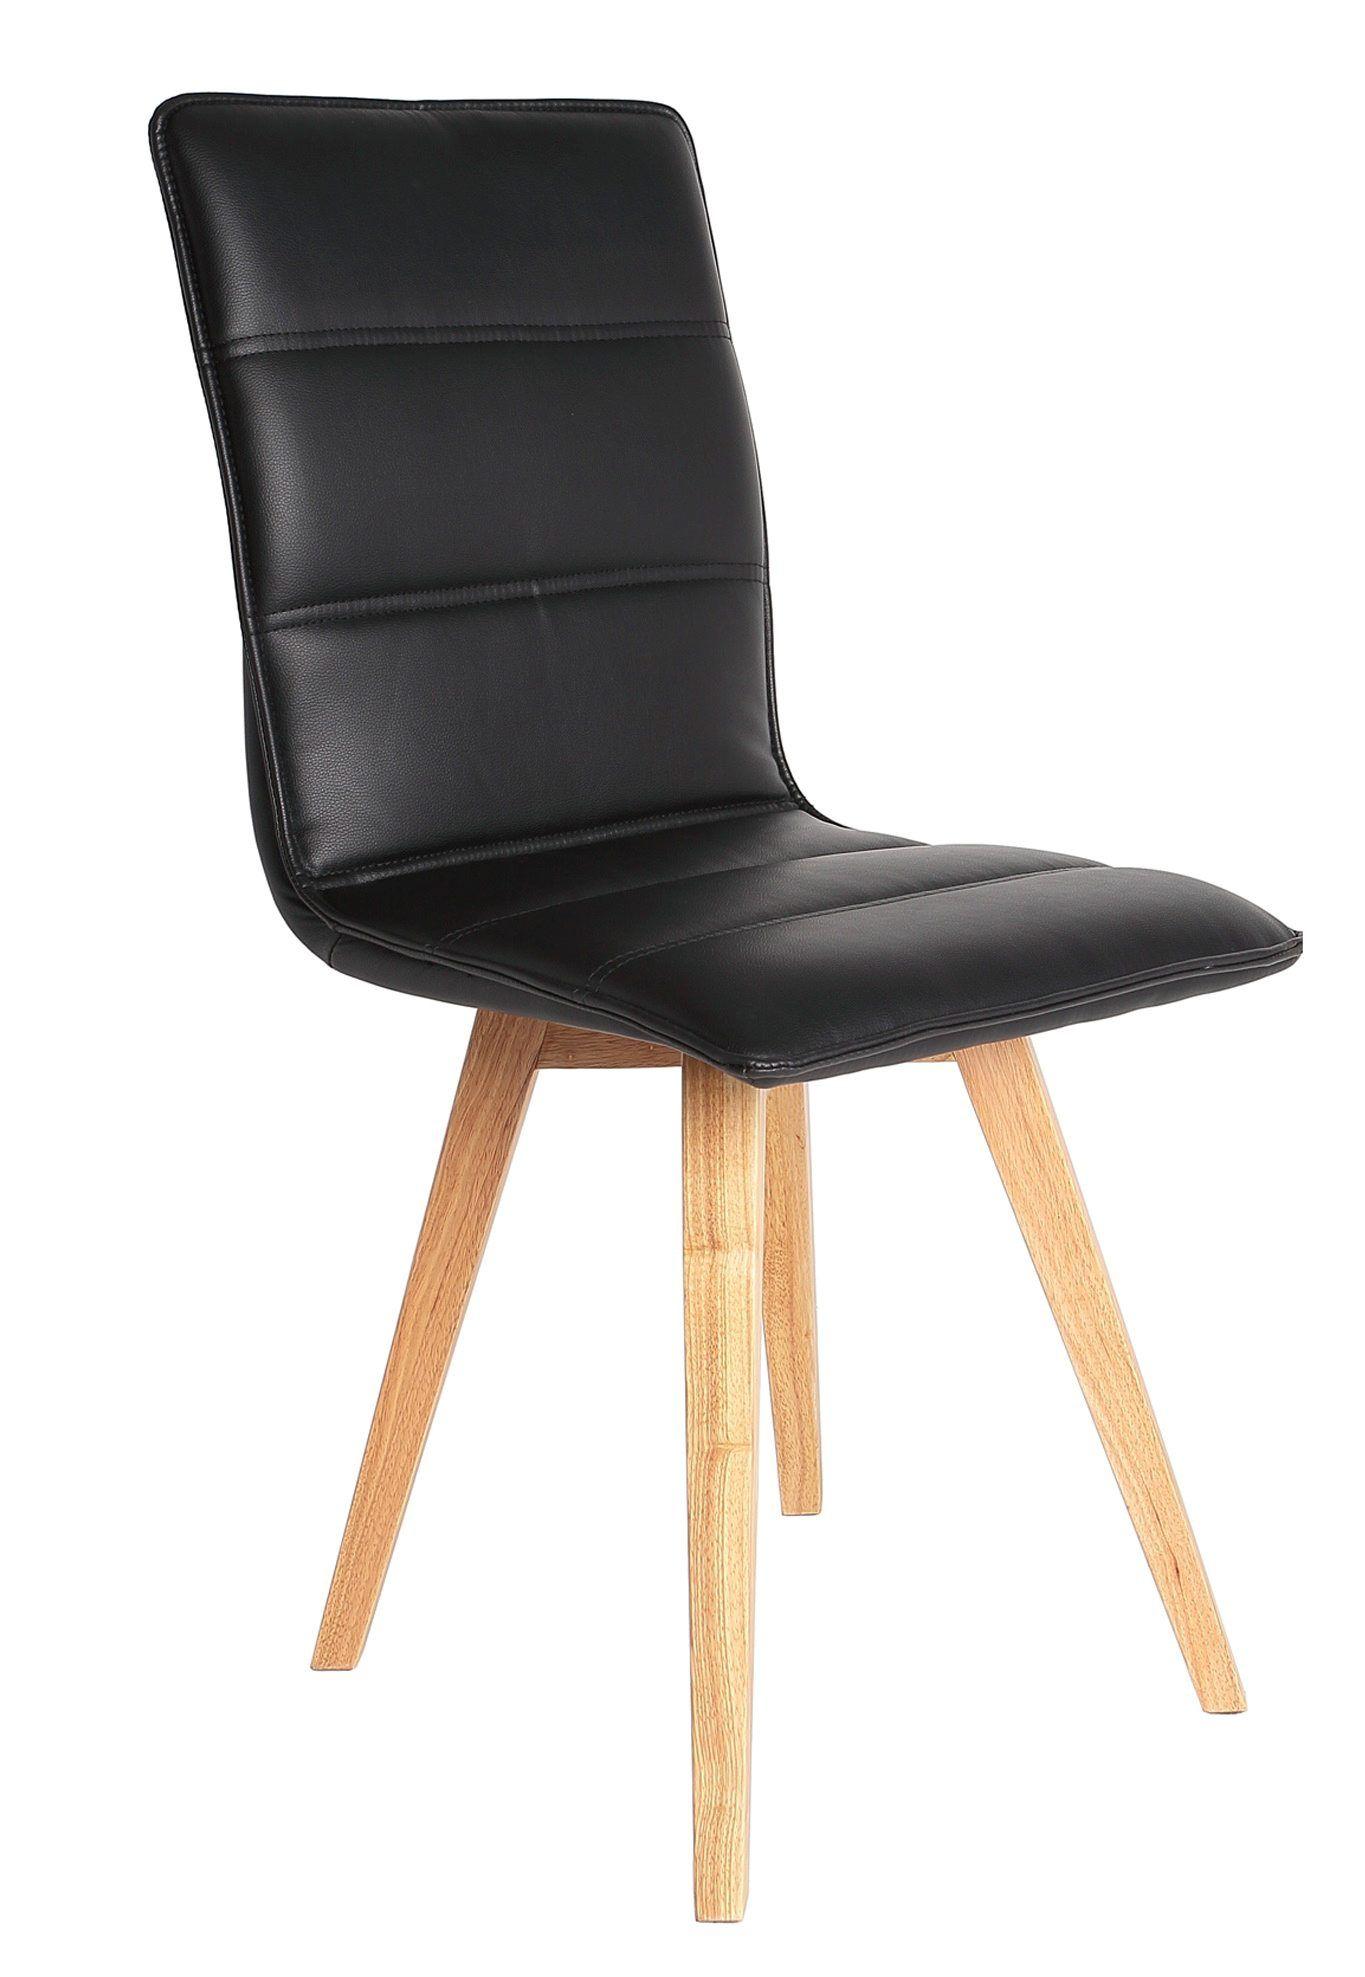 chaise scandinave karla noir but scandinave noir chaise salleamanger - Chaise Scandinave Noir